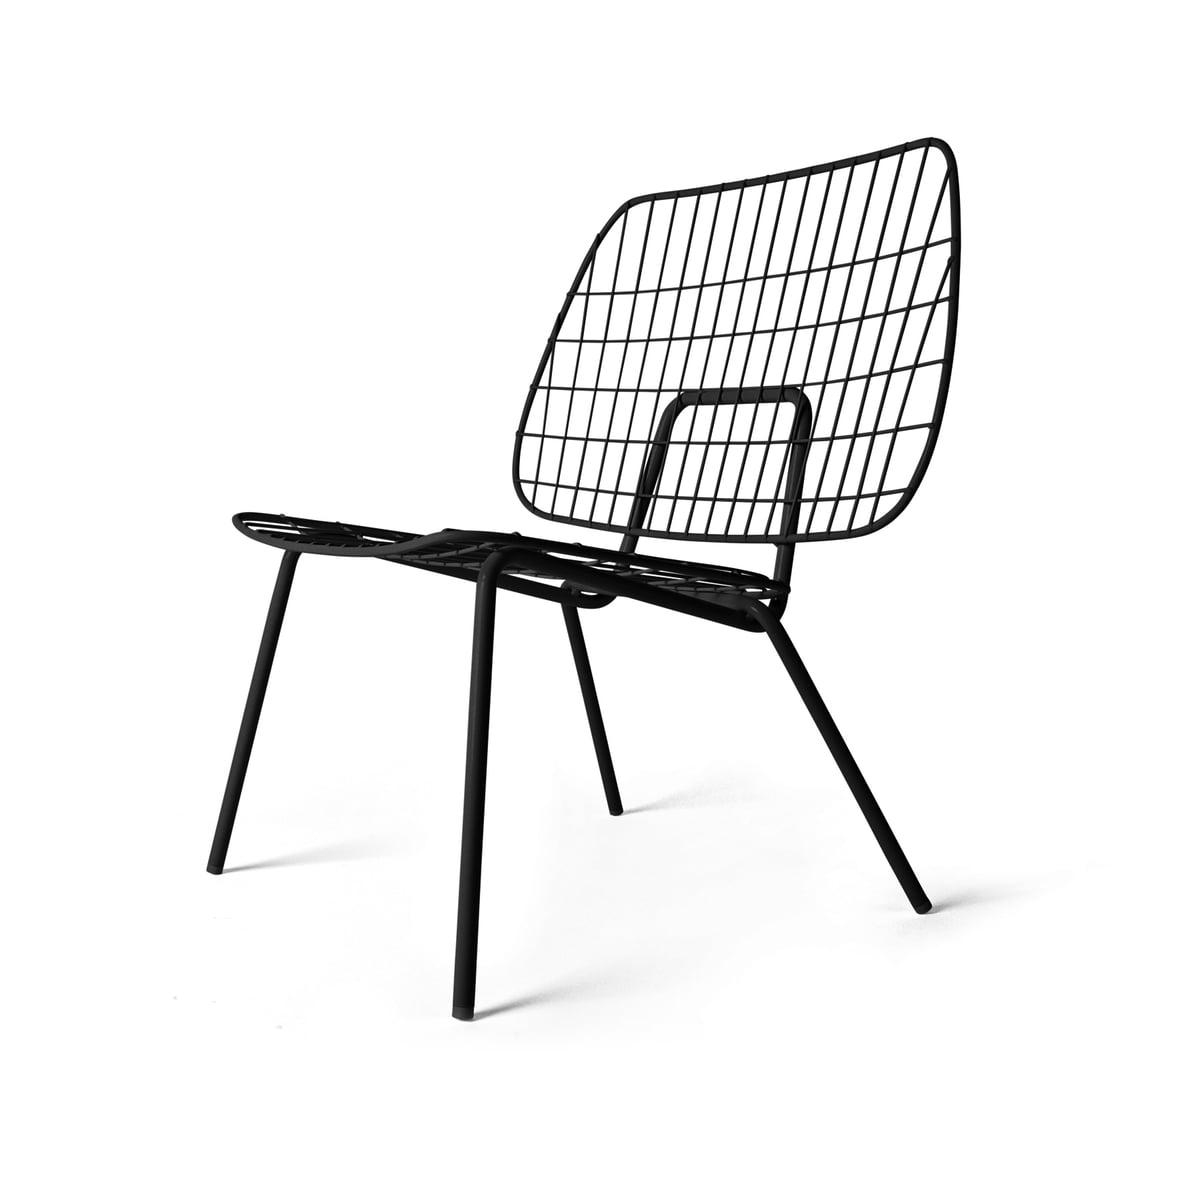 wm string lounge chair von menu connox shop. Black Bedroom Furniture Sets. Home Design Ideas